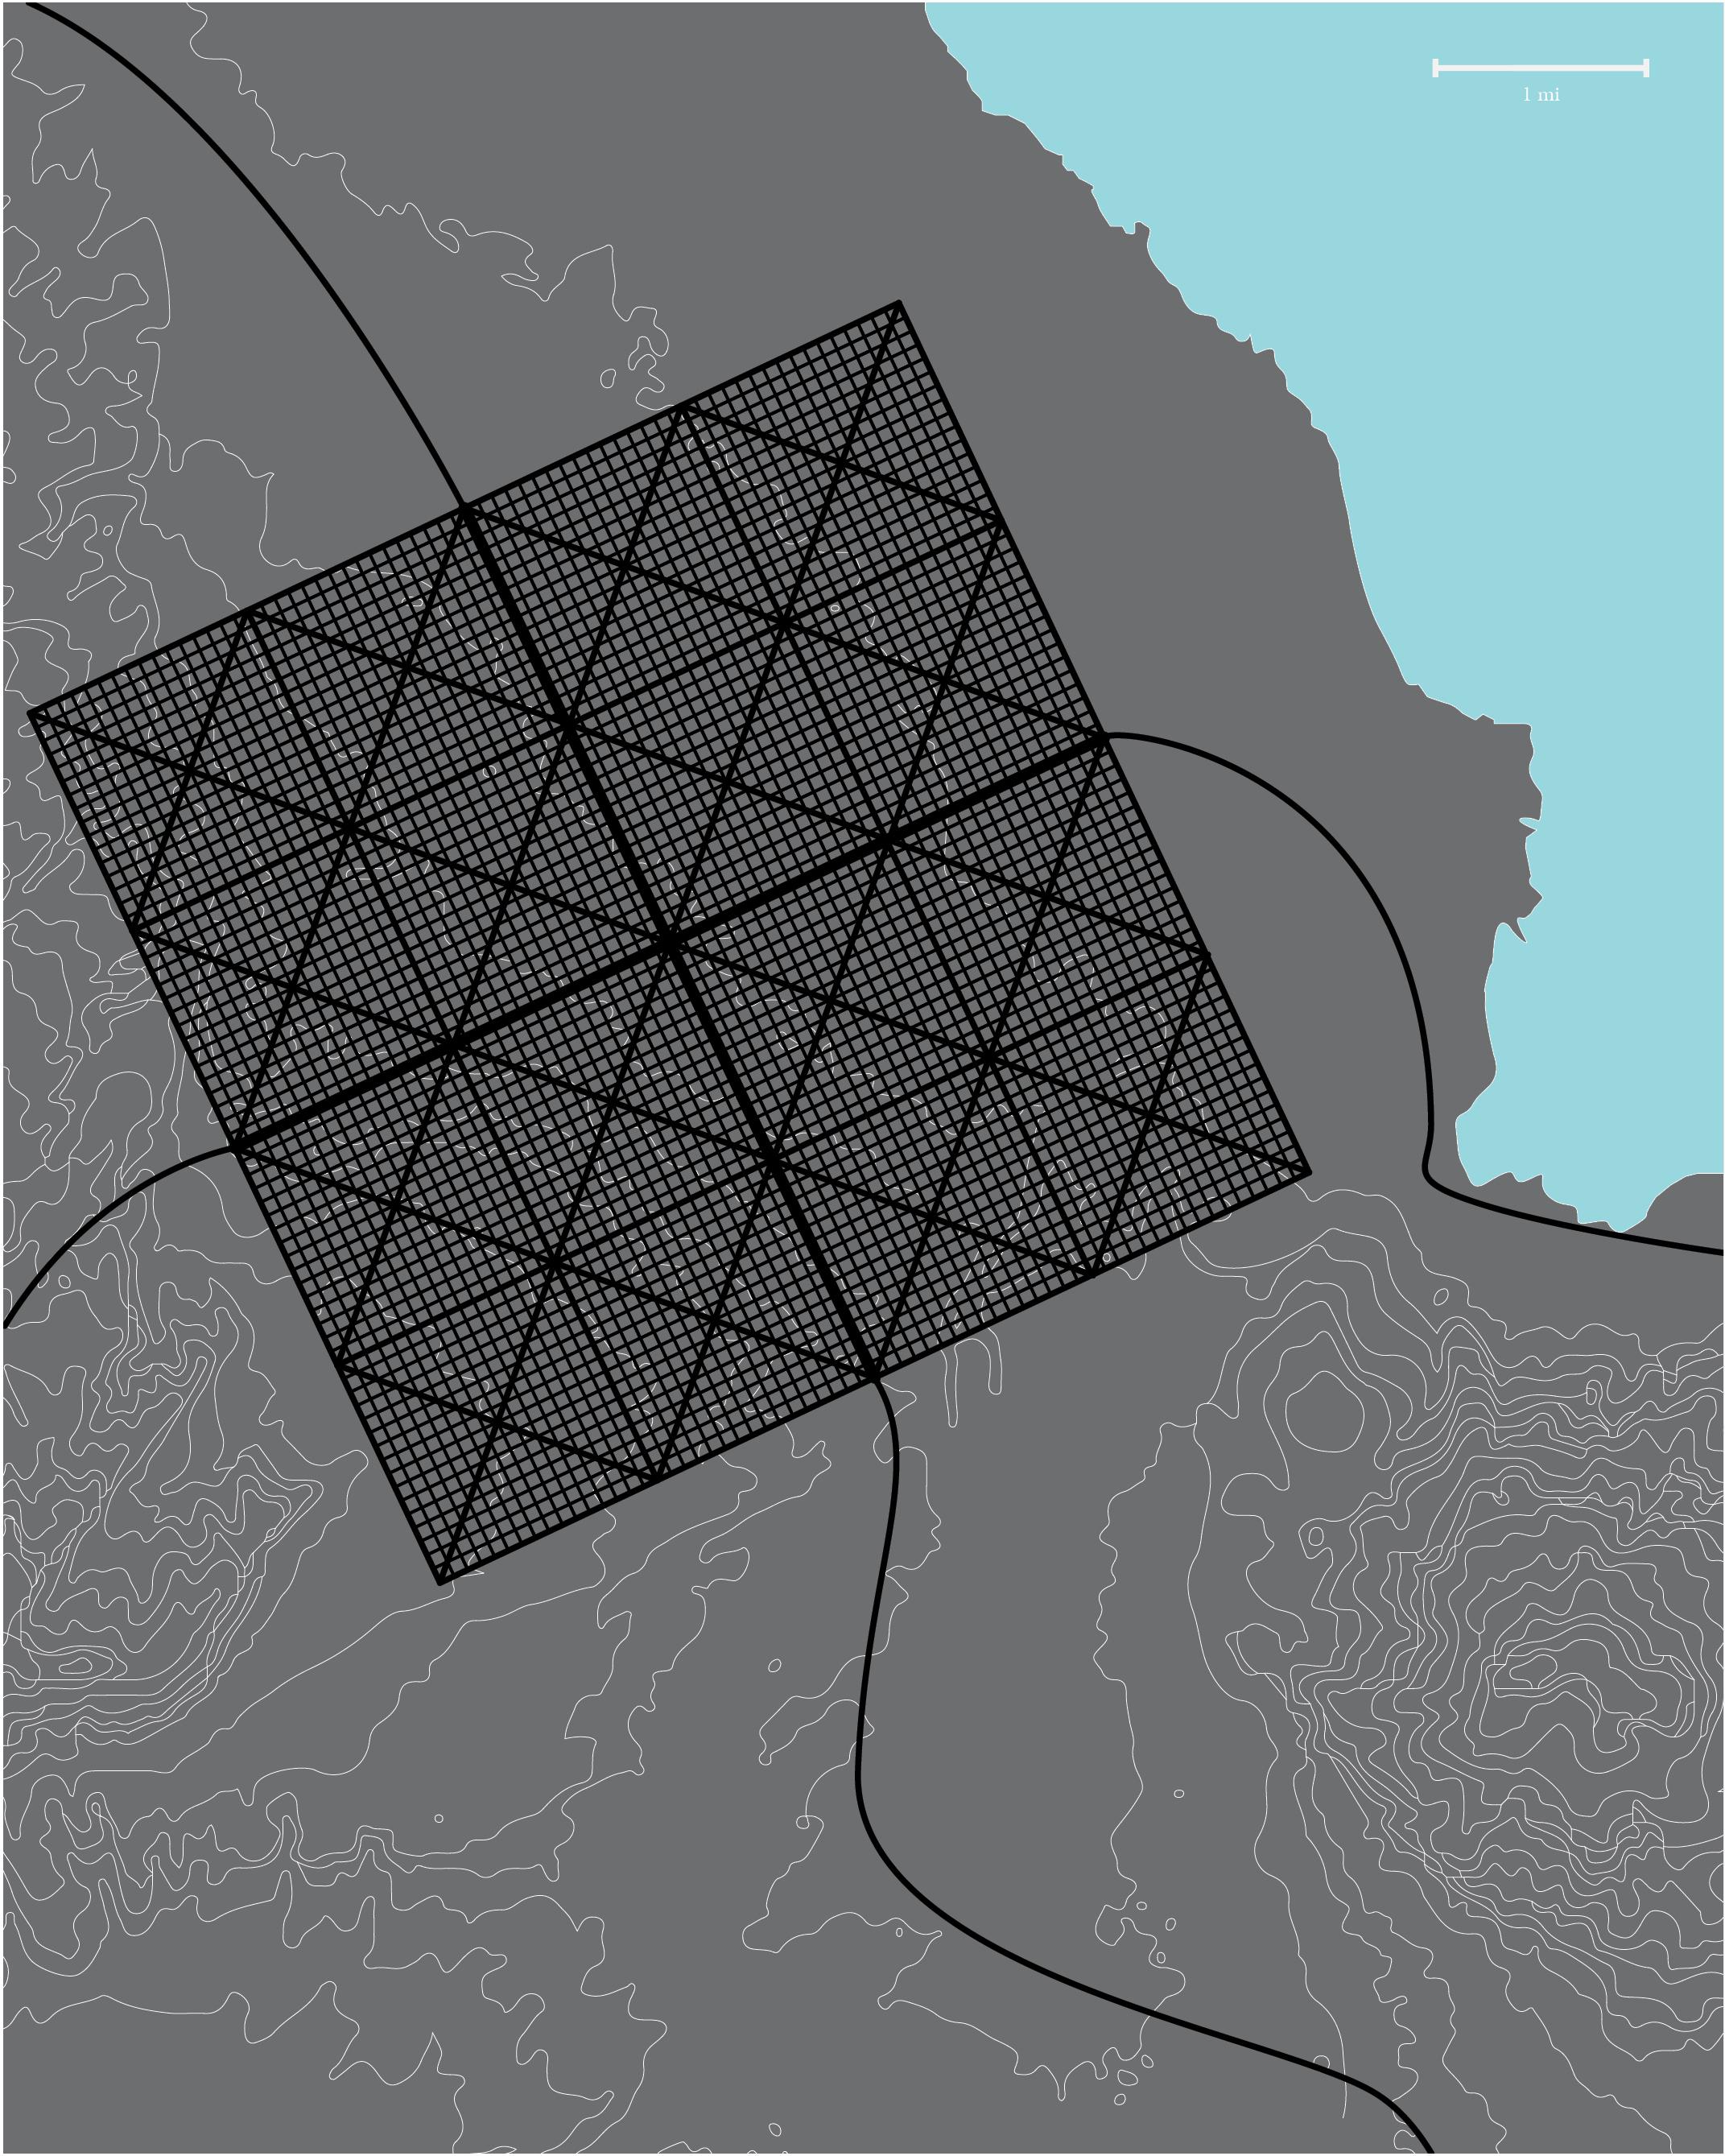 City Grid Simulation 1